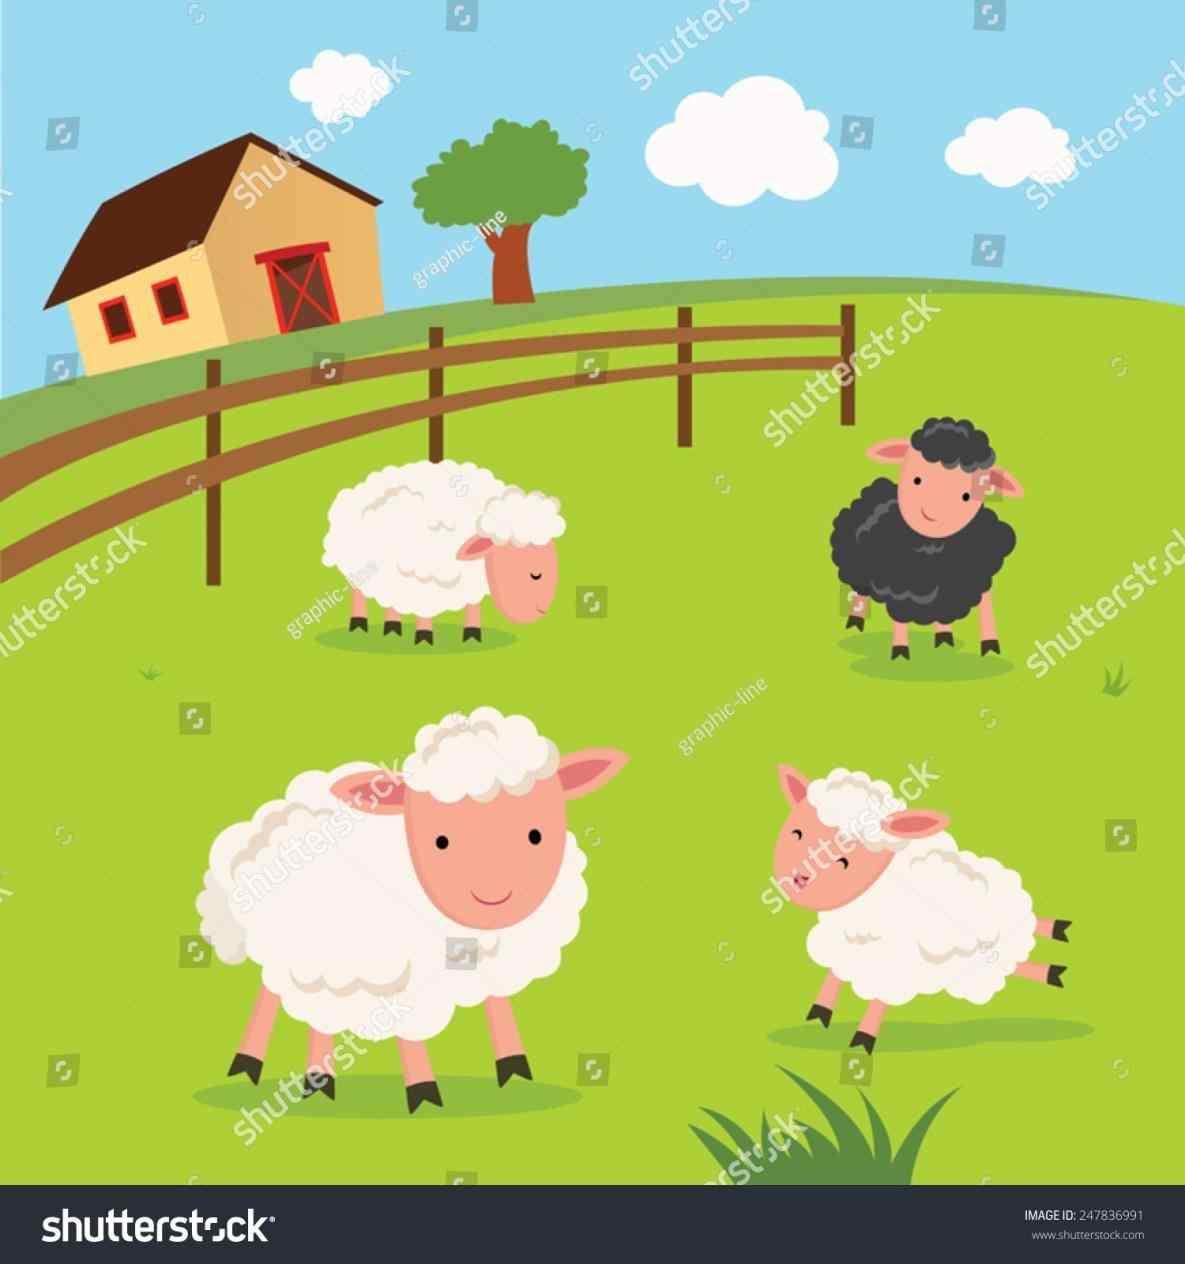 338 Farmhouse free clipart.